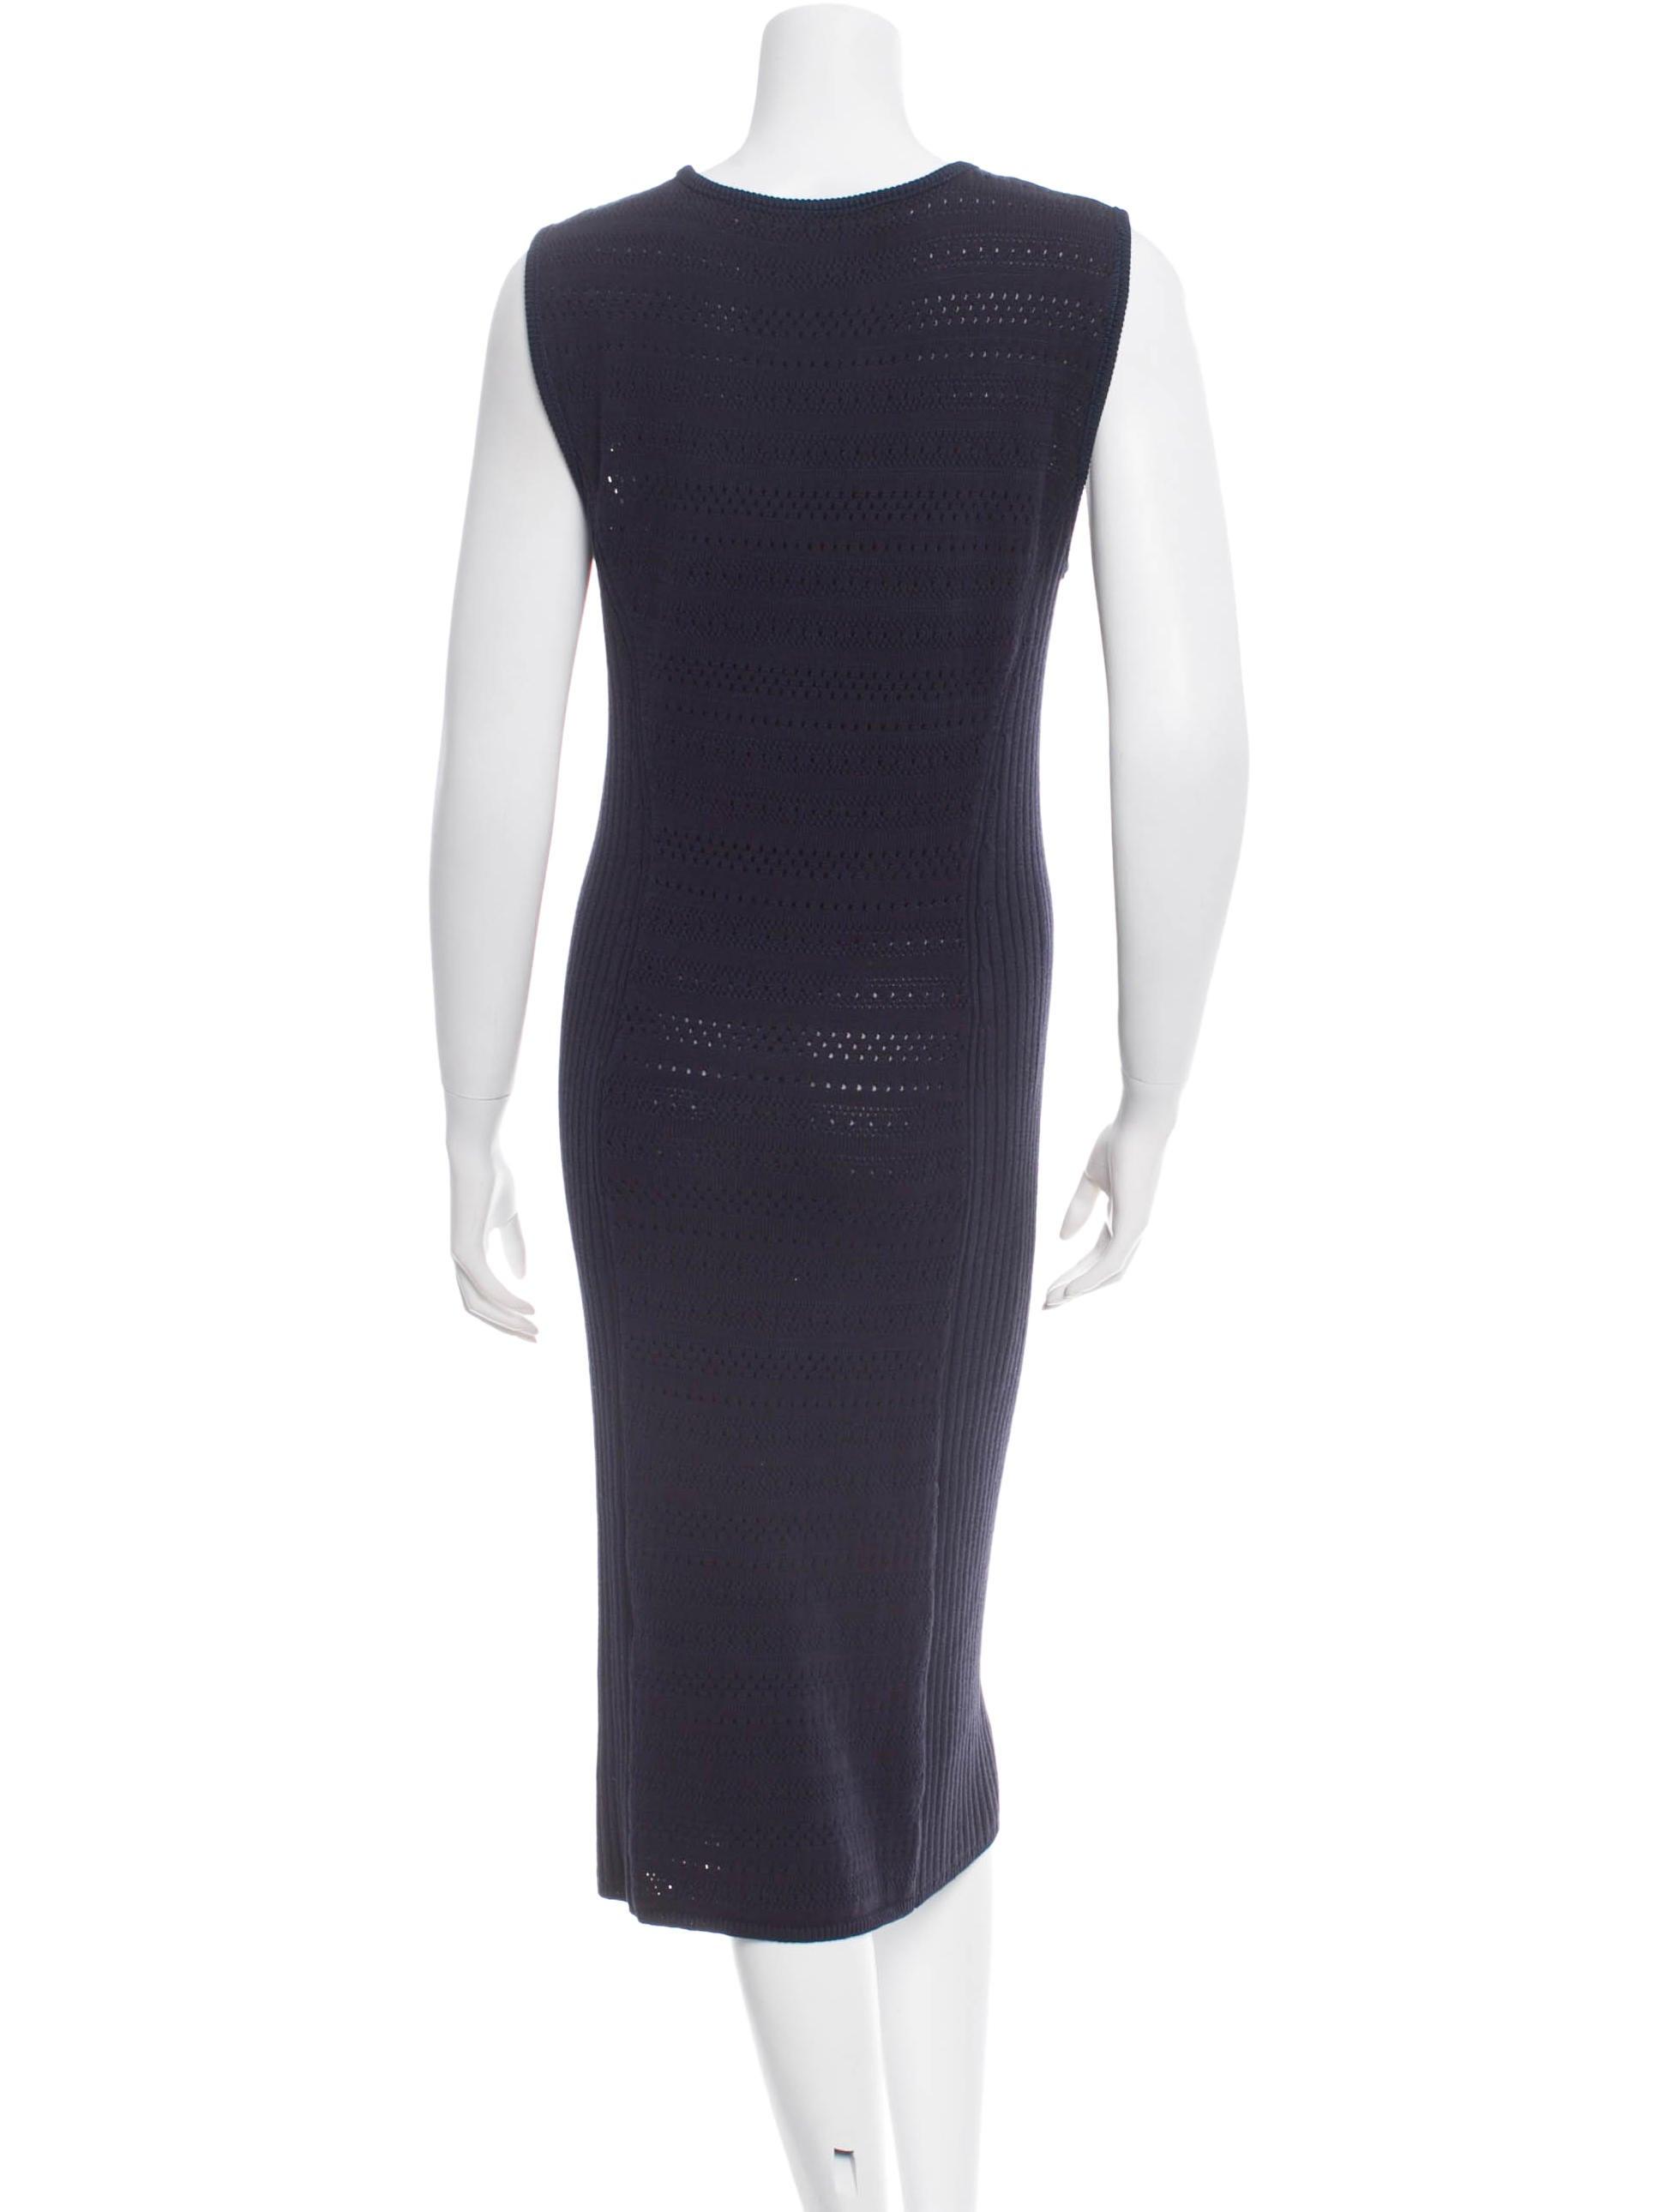 Tory Burch Sleeveless Dress Clothing Wto48433 The